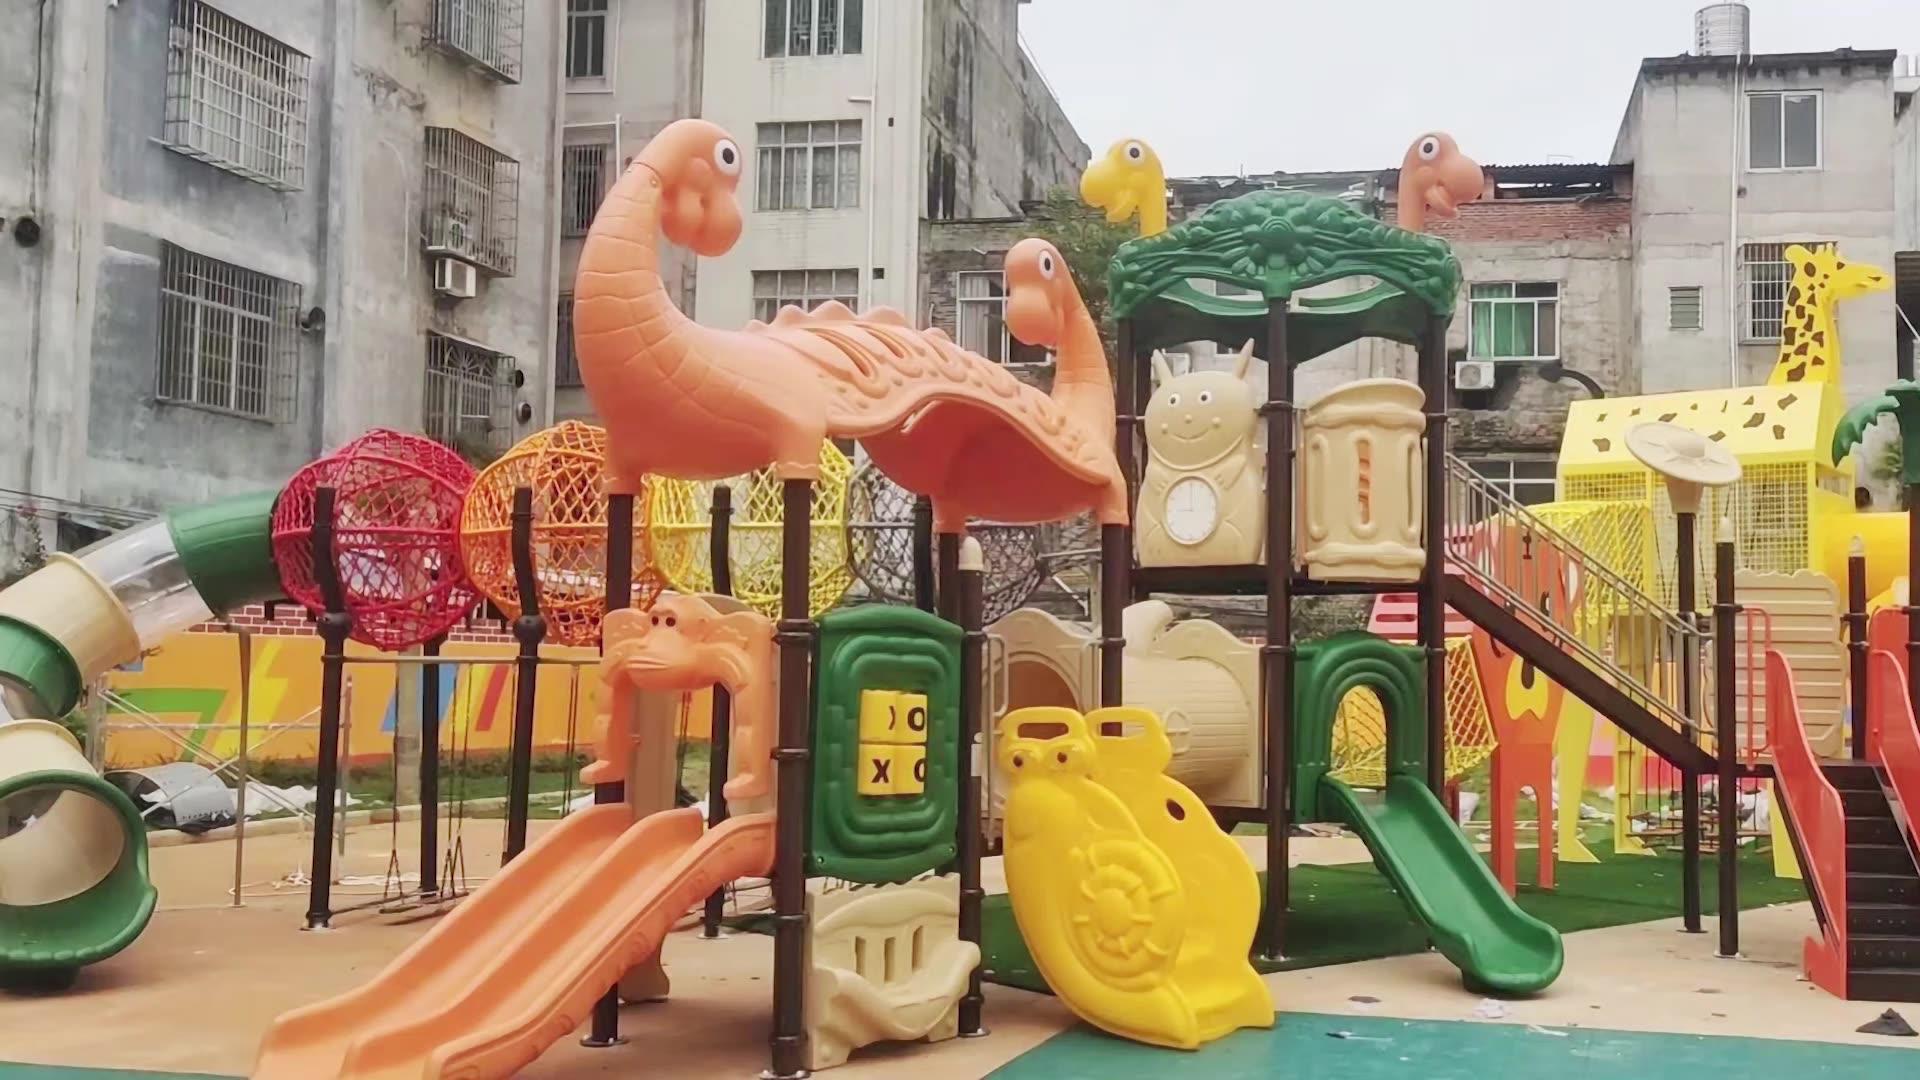 Jardim de infância preschool children slides parque de diversões para venda